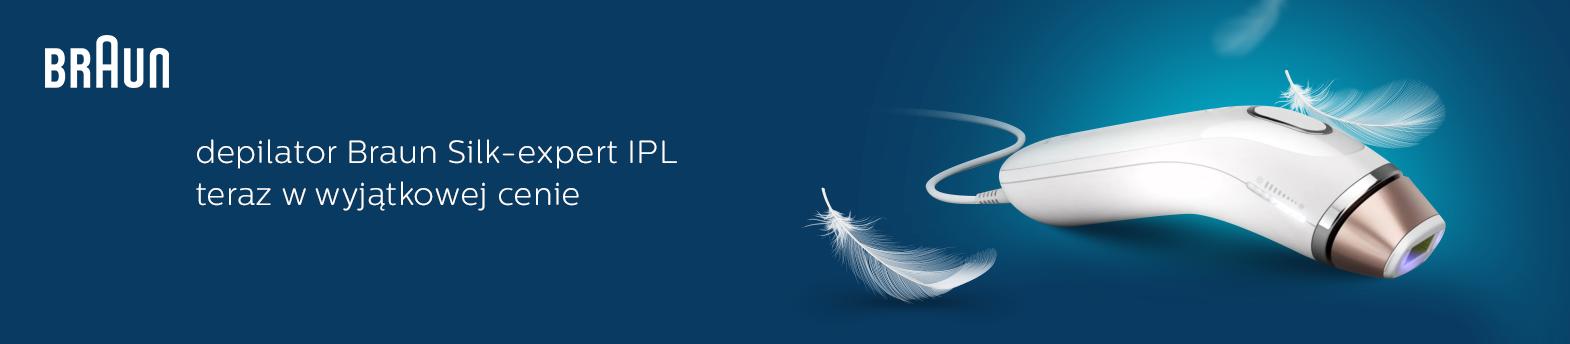 Braun Silk-expert IPL BD5009